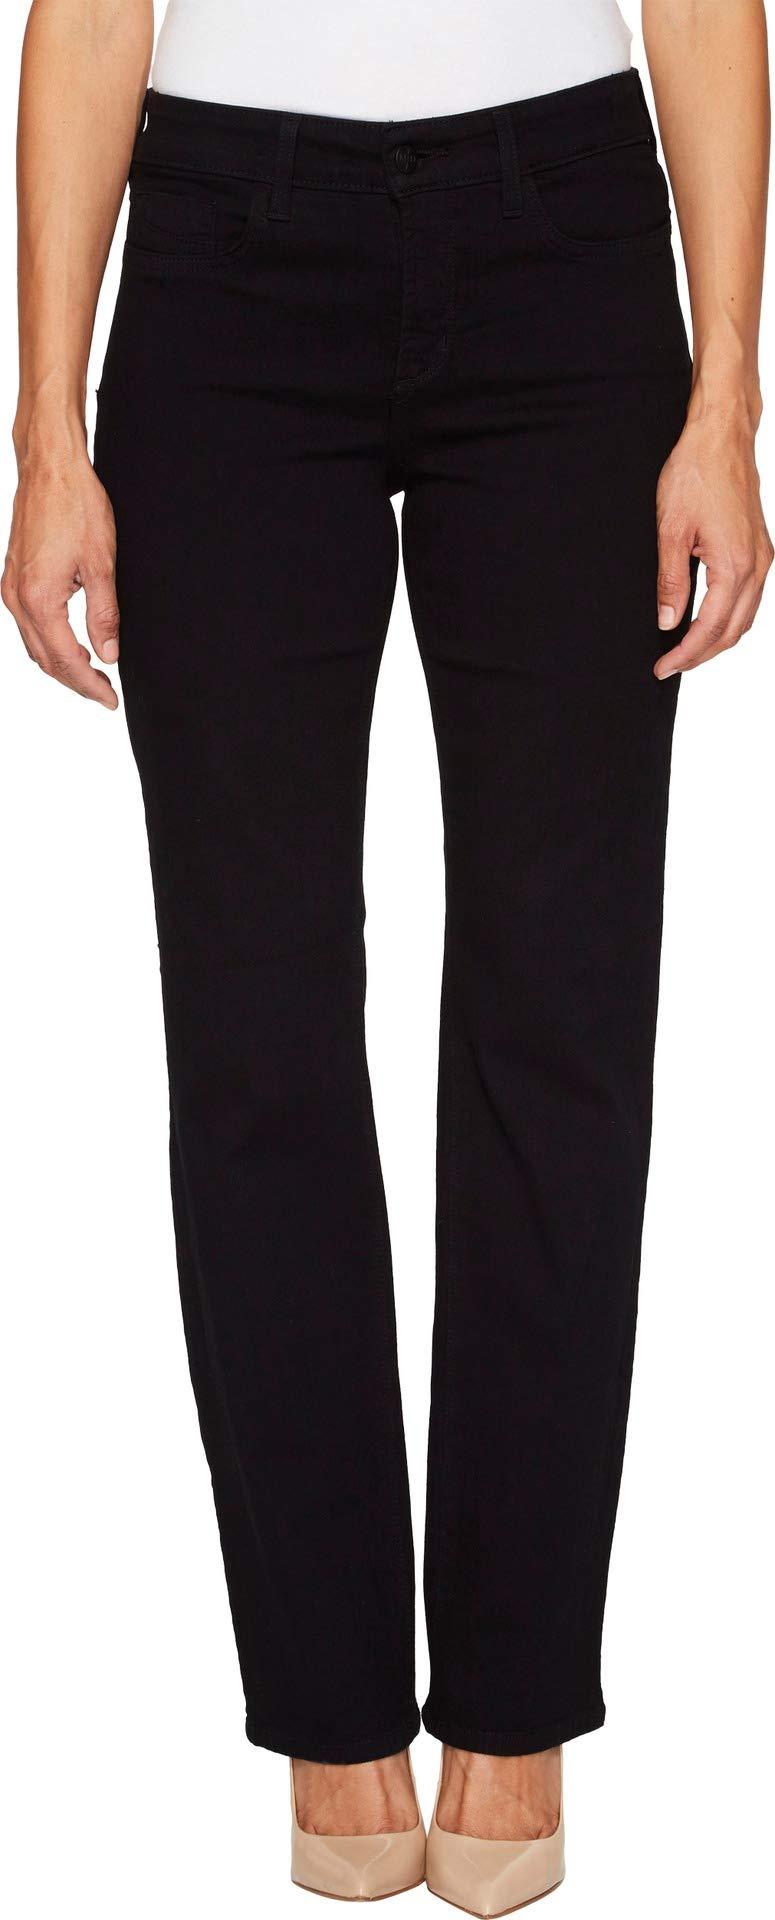 NYDJ Women's Petite Marilyn Straight Jeans, Black, 0P